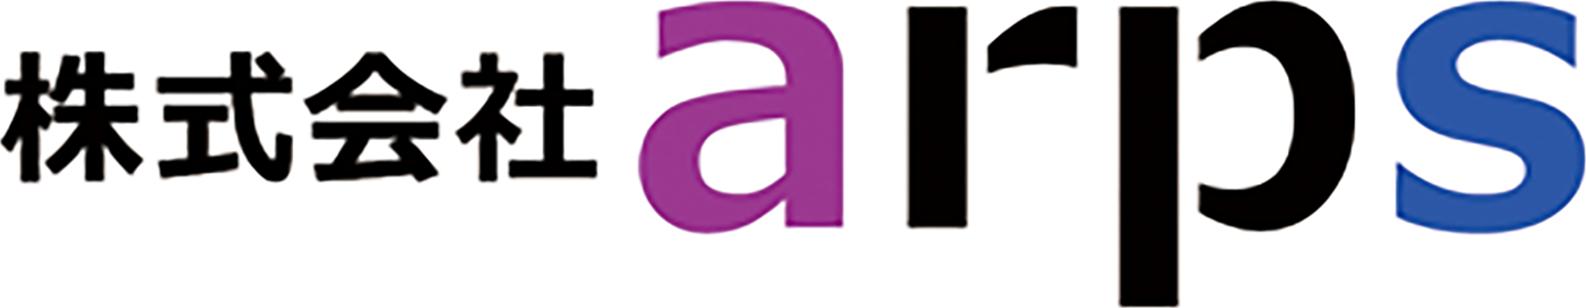 株式会社arps